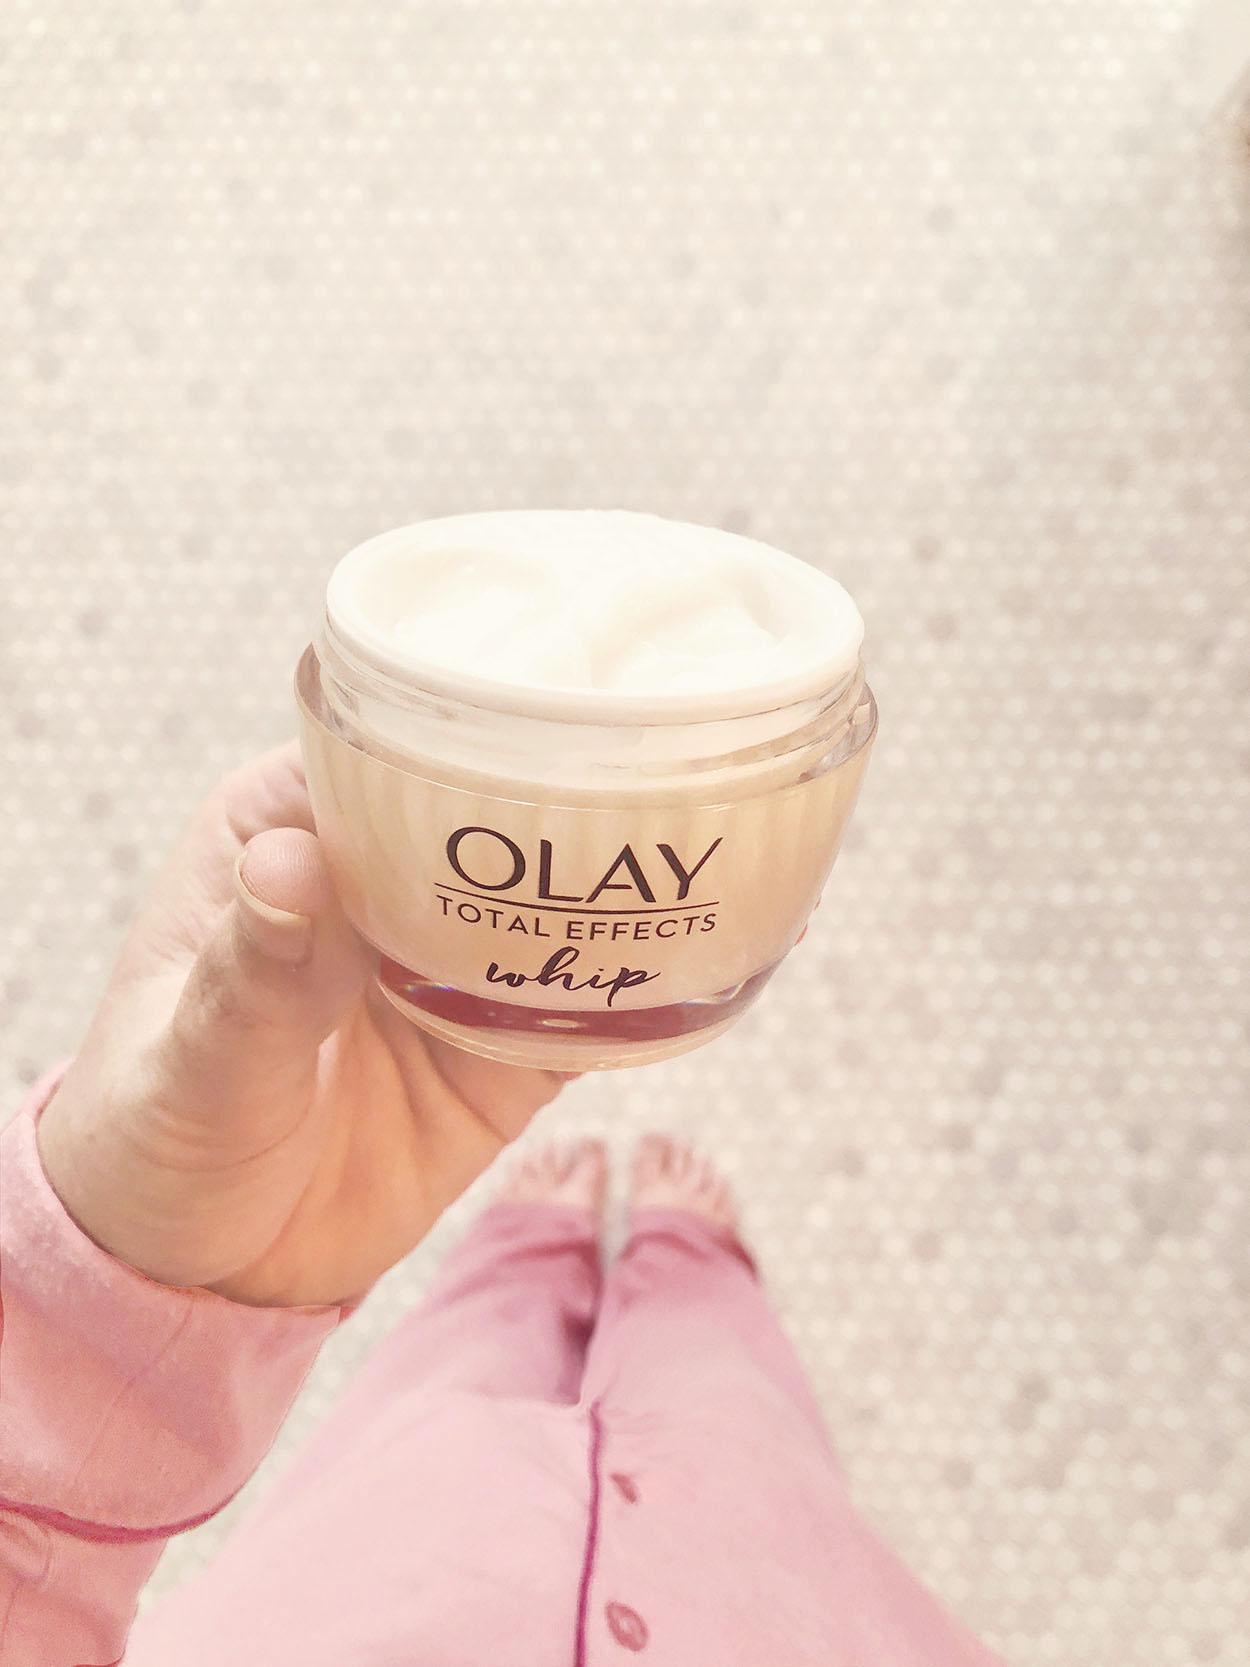 Olay Whips Moisturizer for Winter Skin - Jami Ray 30A Mama Beauty